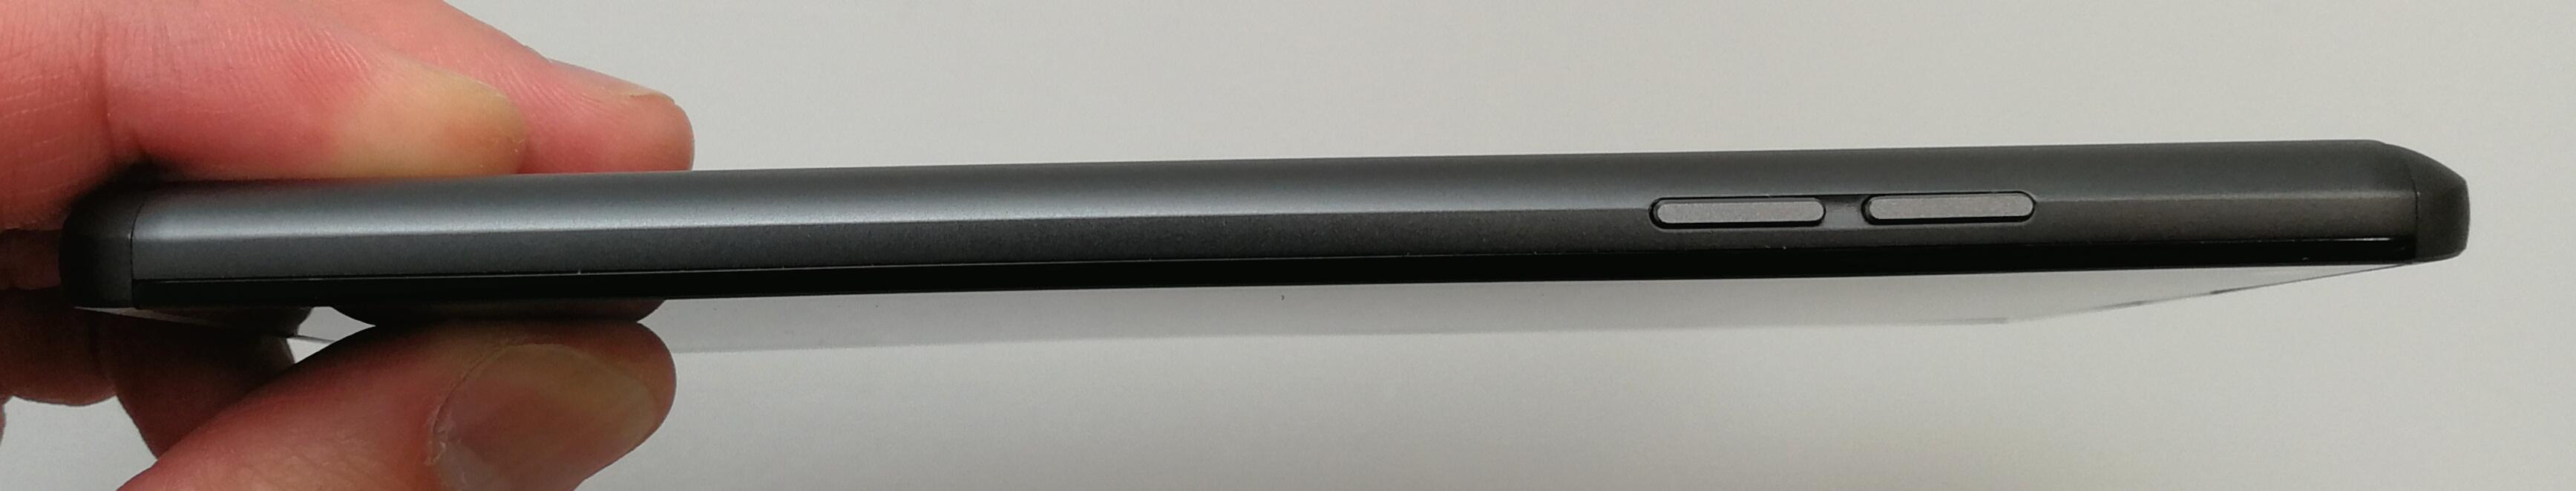 LG V20 PRO L-01J実機フォトレビュー!デュアルカメラ搭載に加え、想像を超える135°広角レンズが凄い